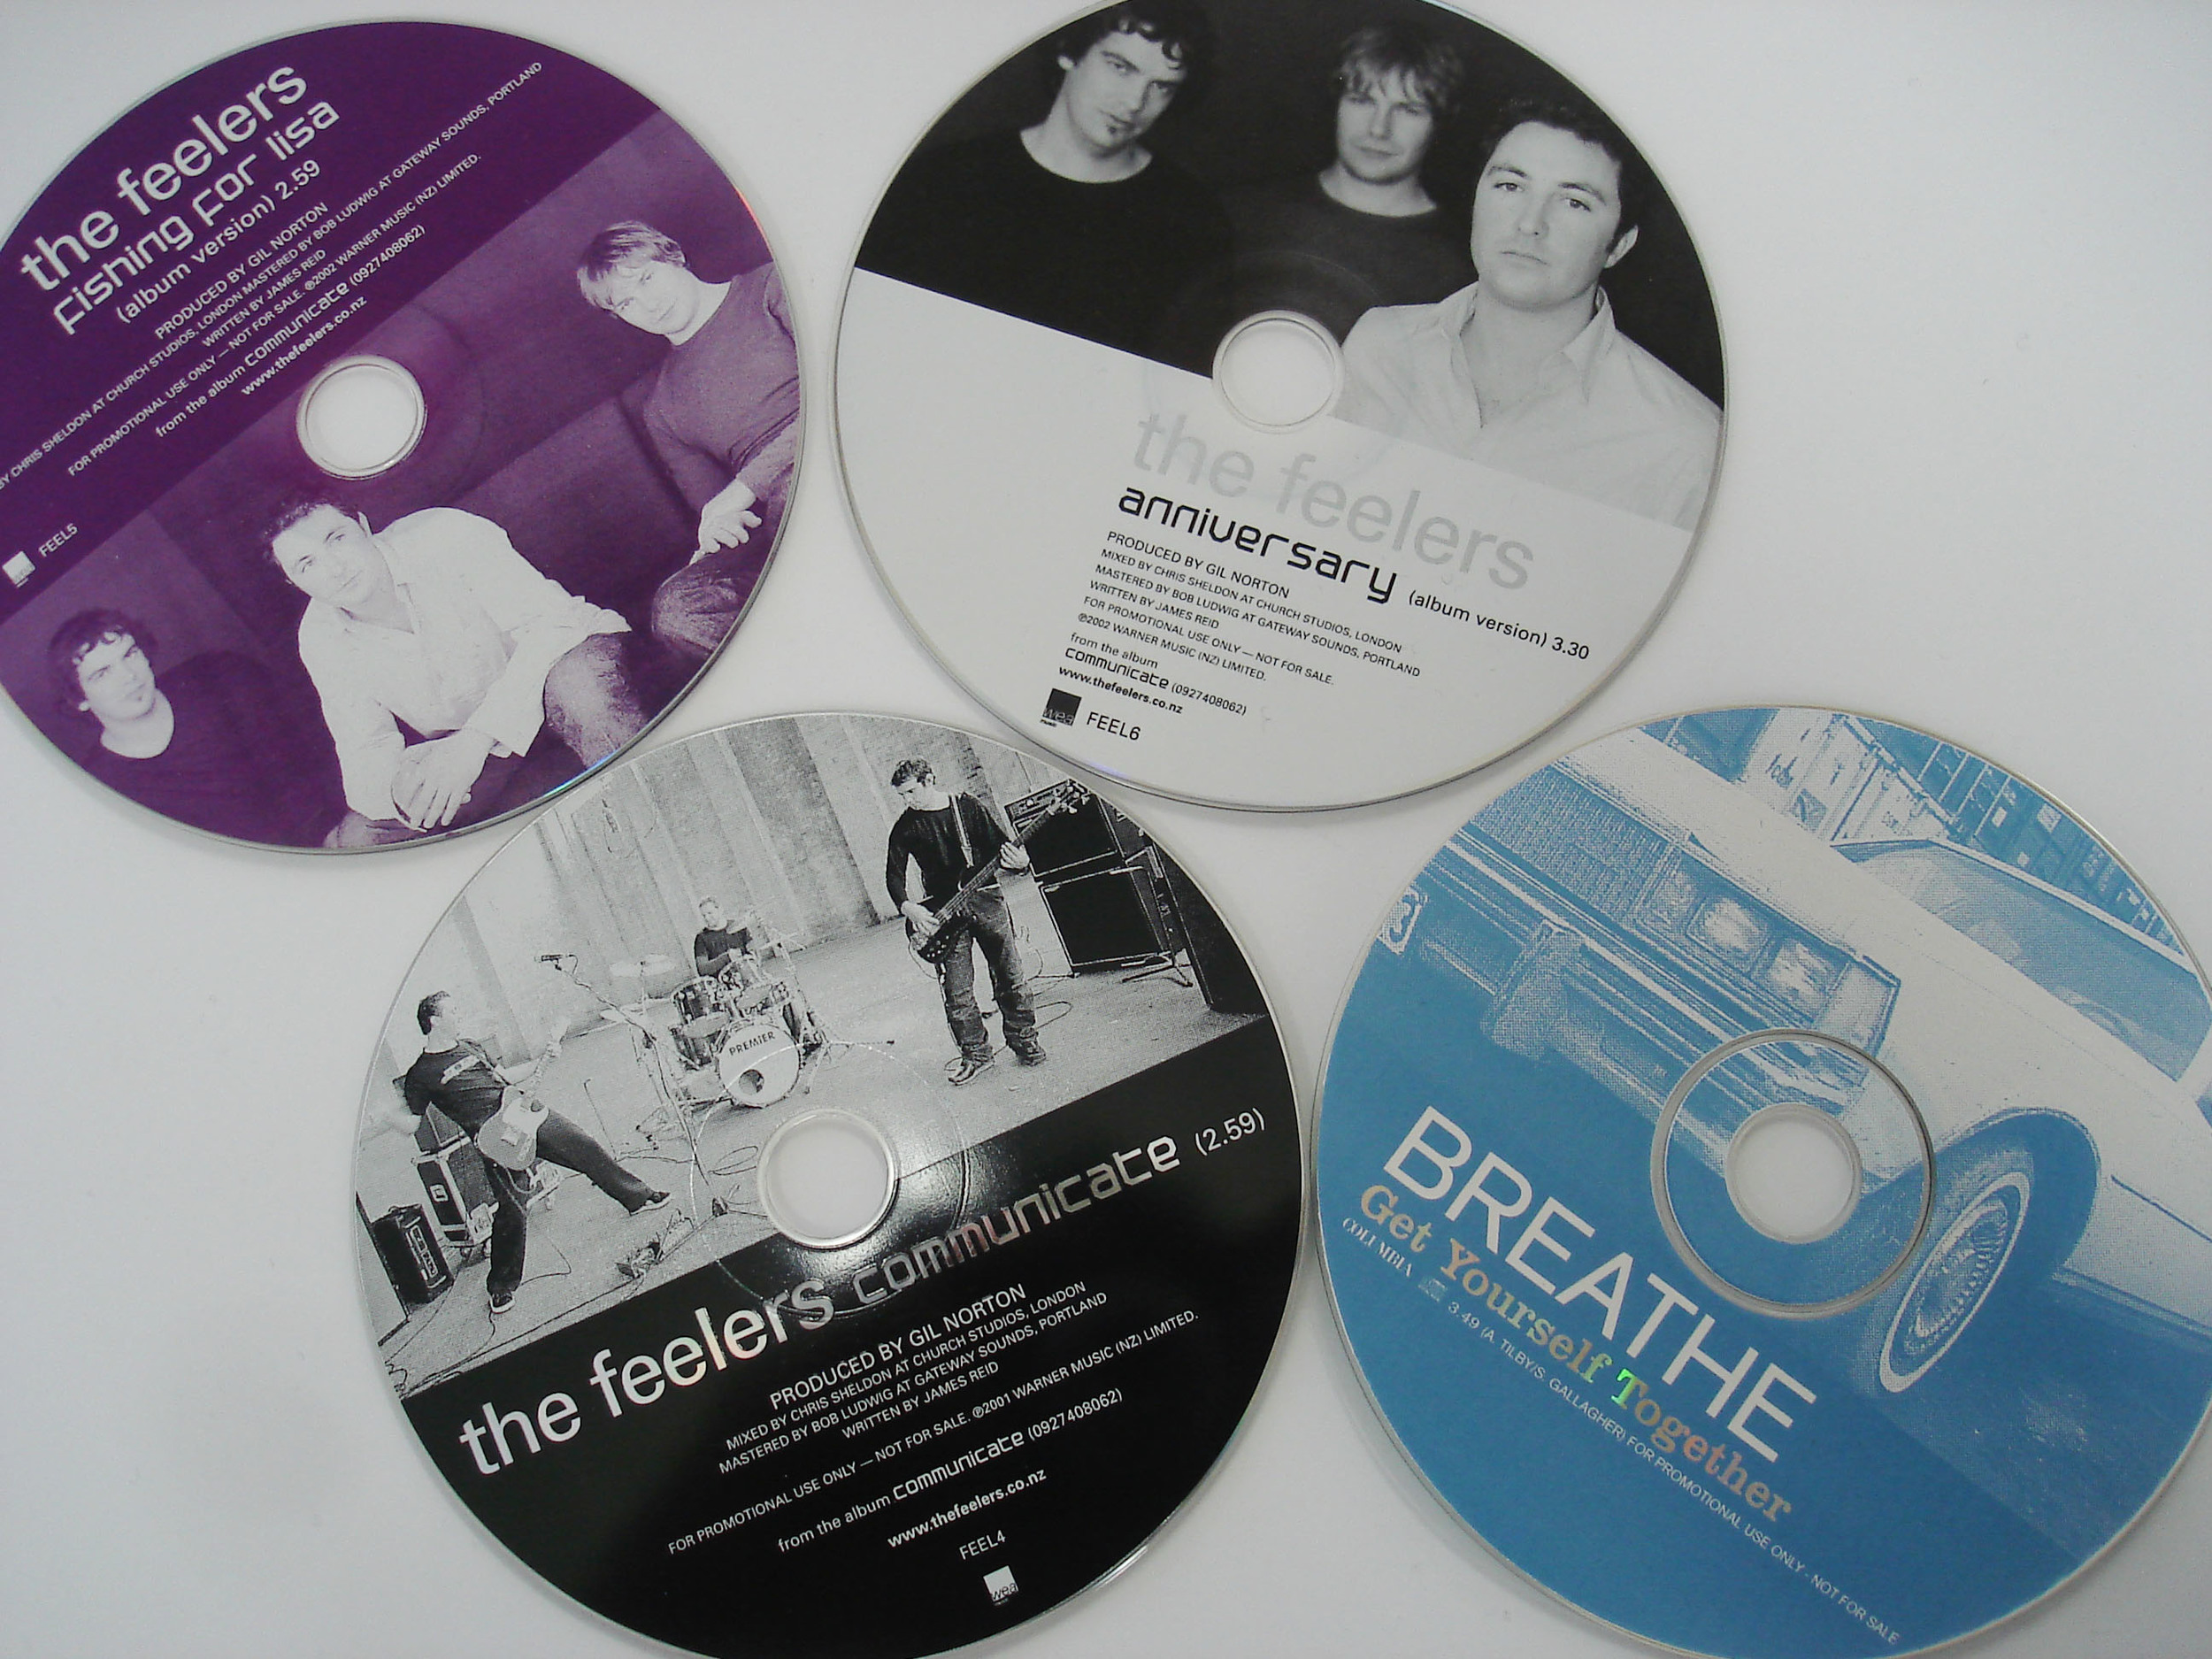 THE FEELERS/BREATHE - PROMO CDs